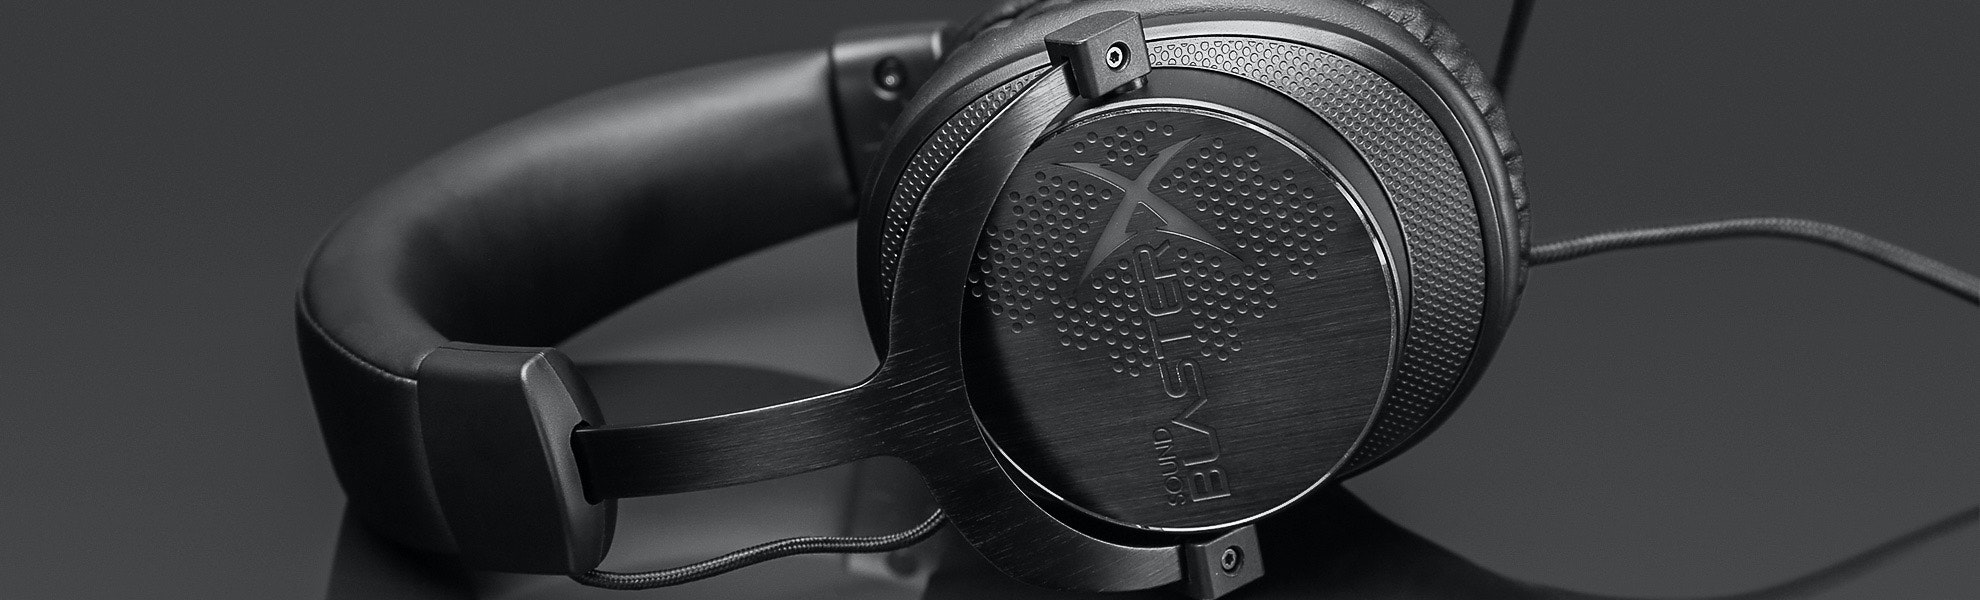 Creative H7 BlasterX Headset w/Stand